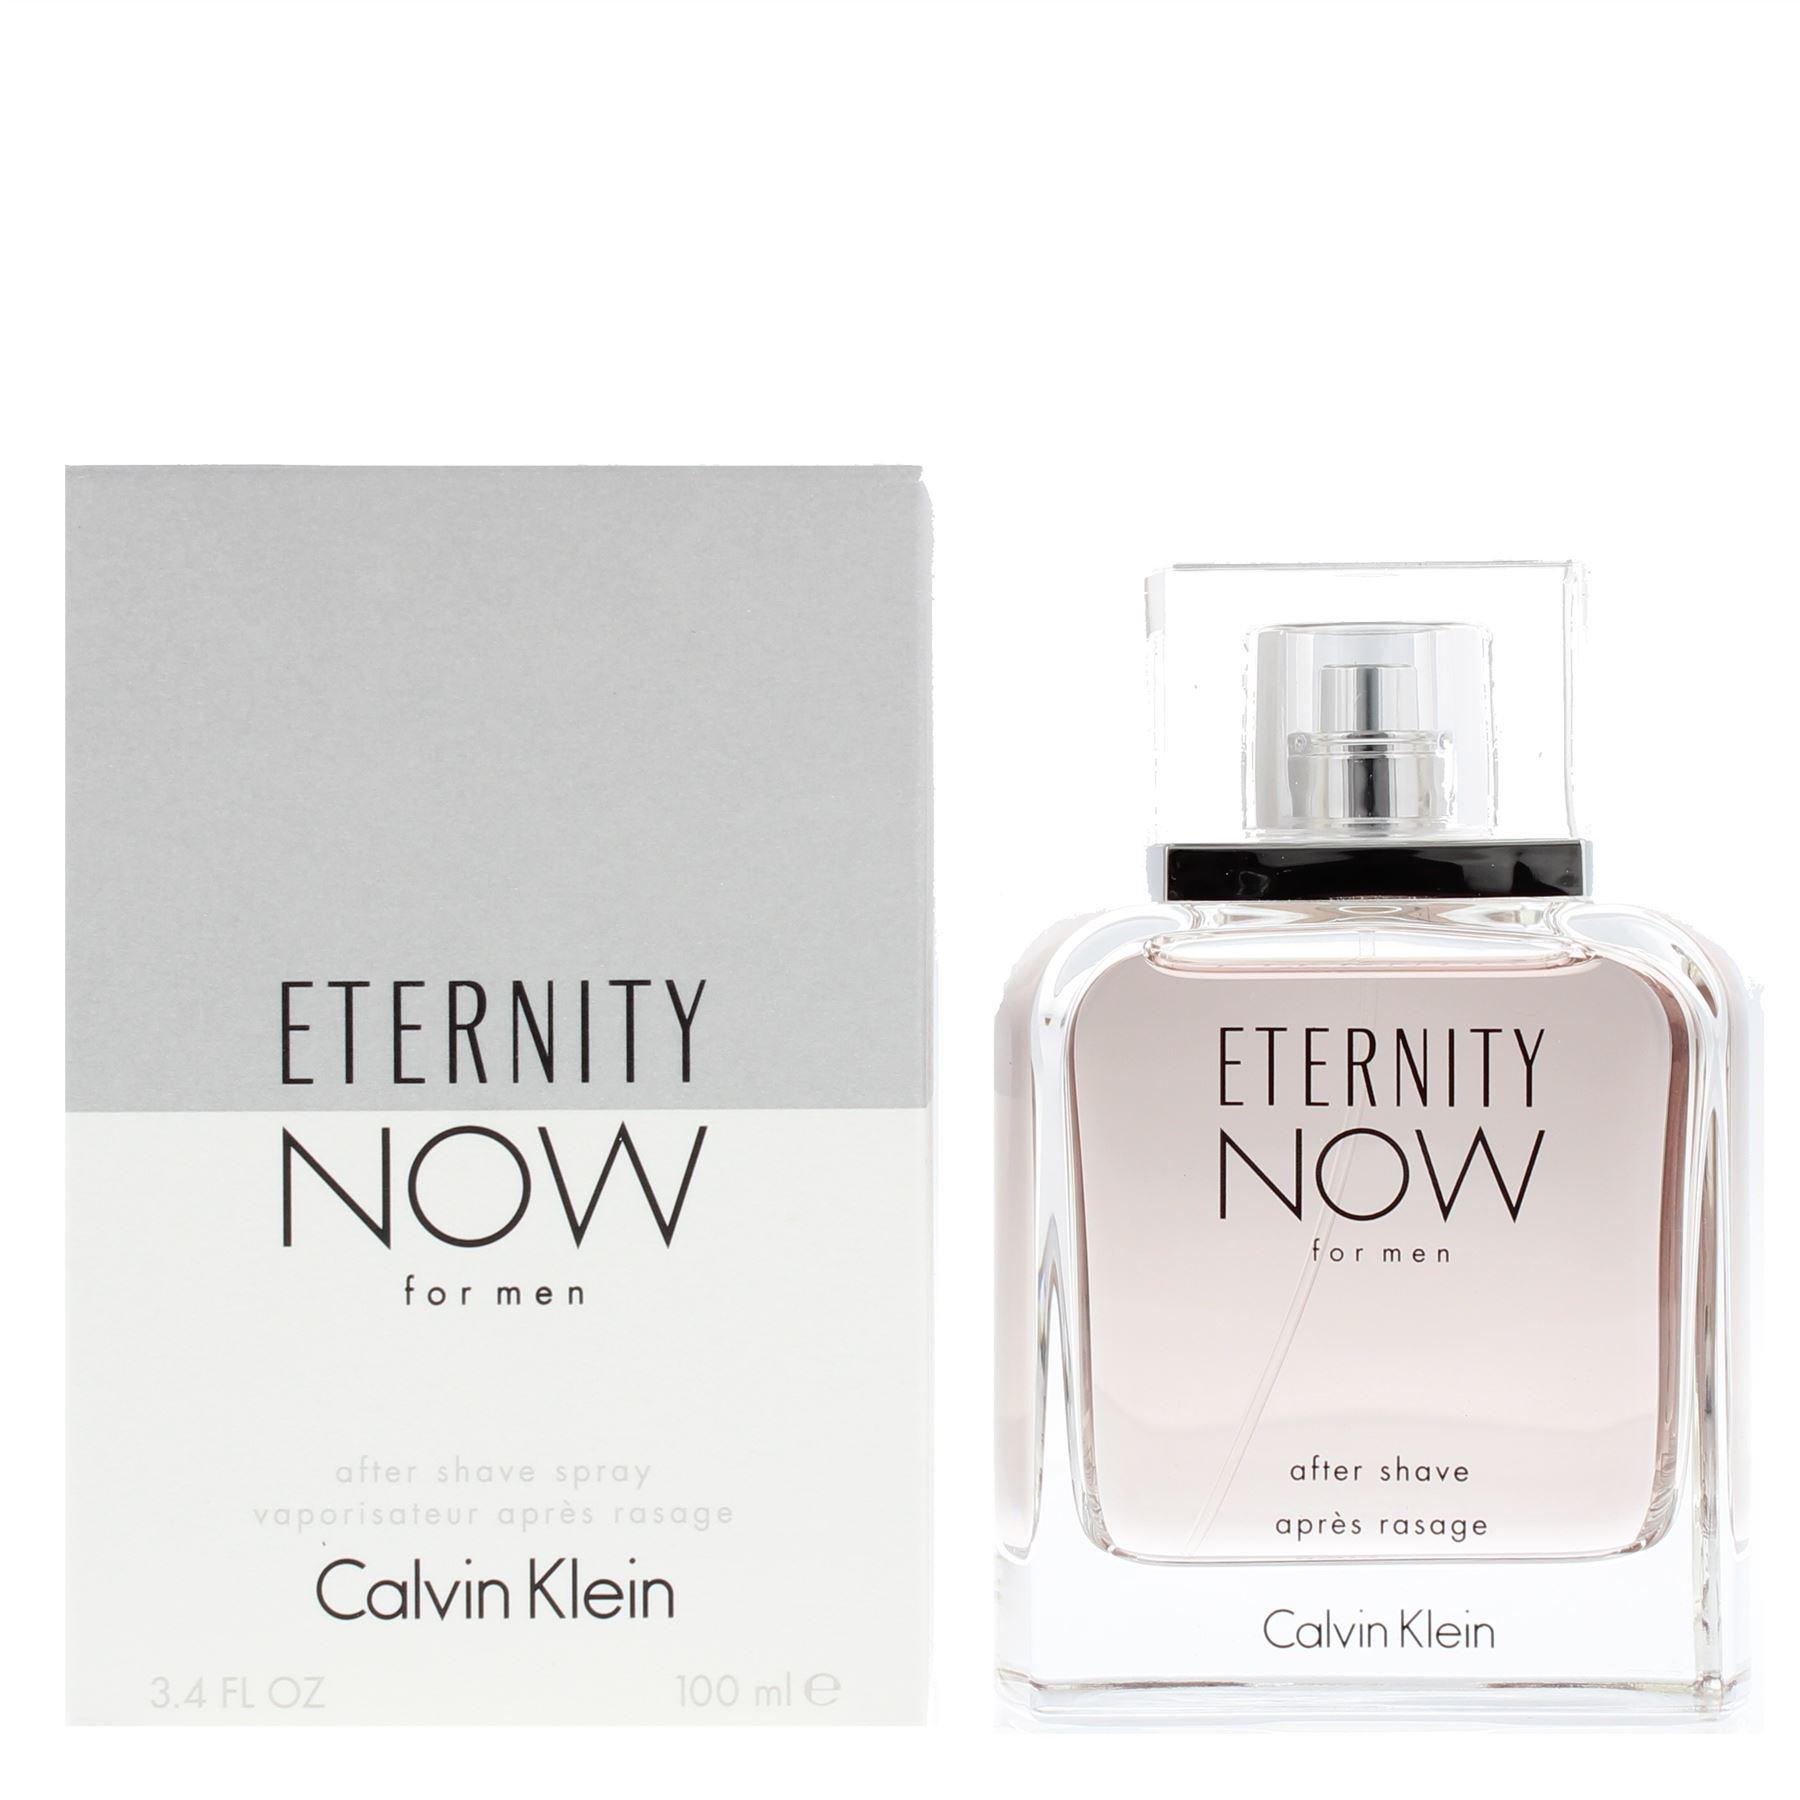 afdbd35d4 Details about Calvin Klein Eternity Now For Men After Shave 100ml Spray  NEW. Men s Aftershave